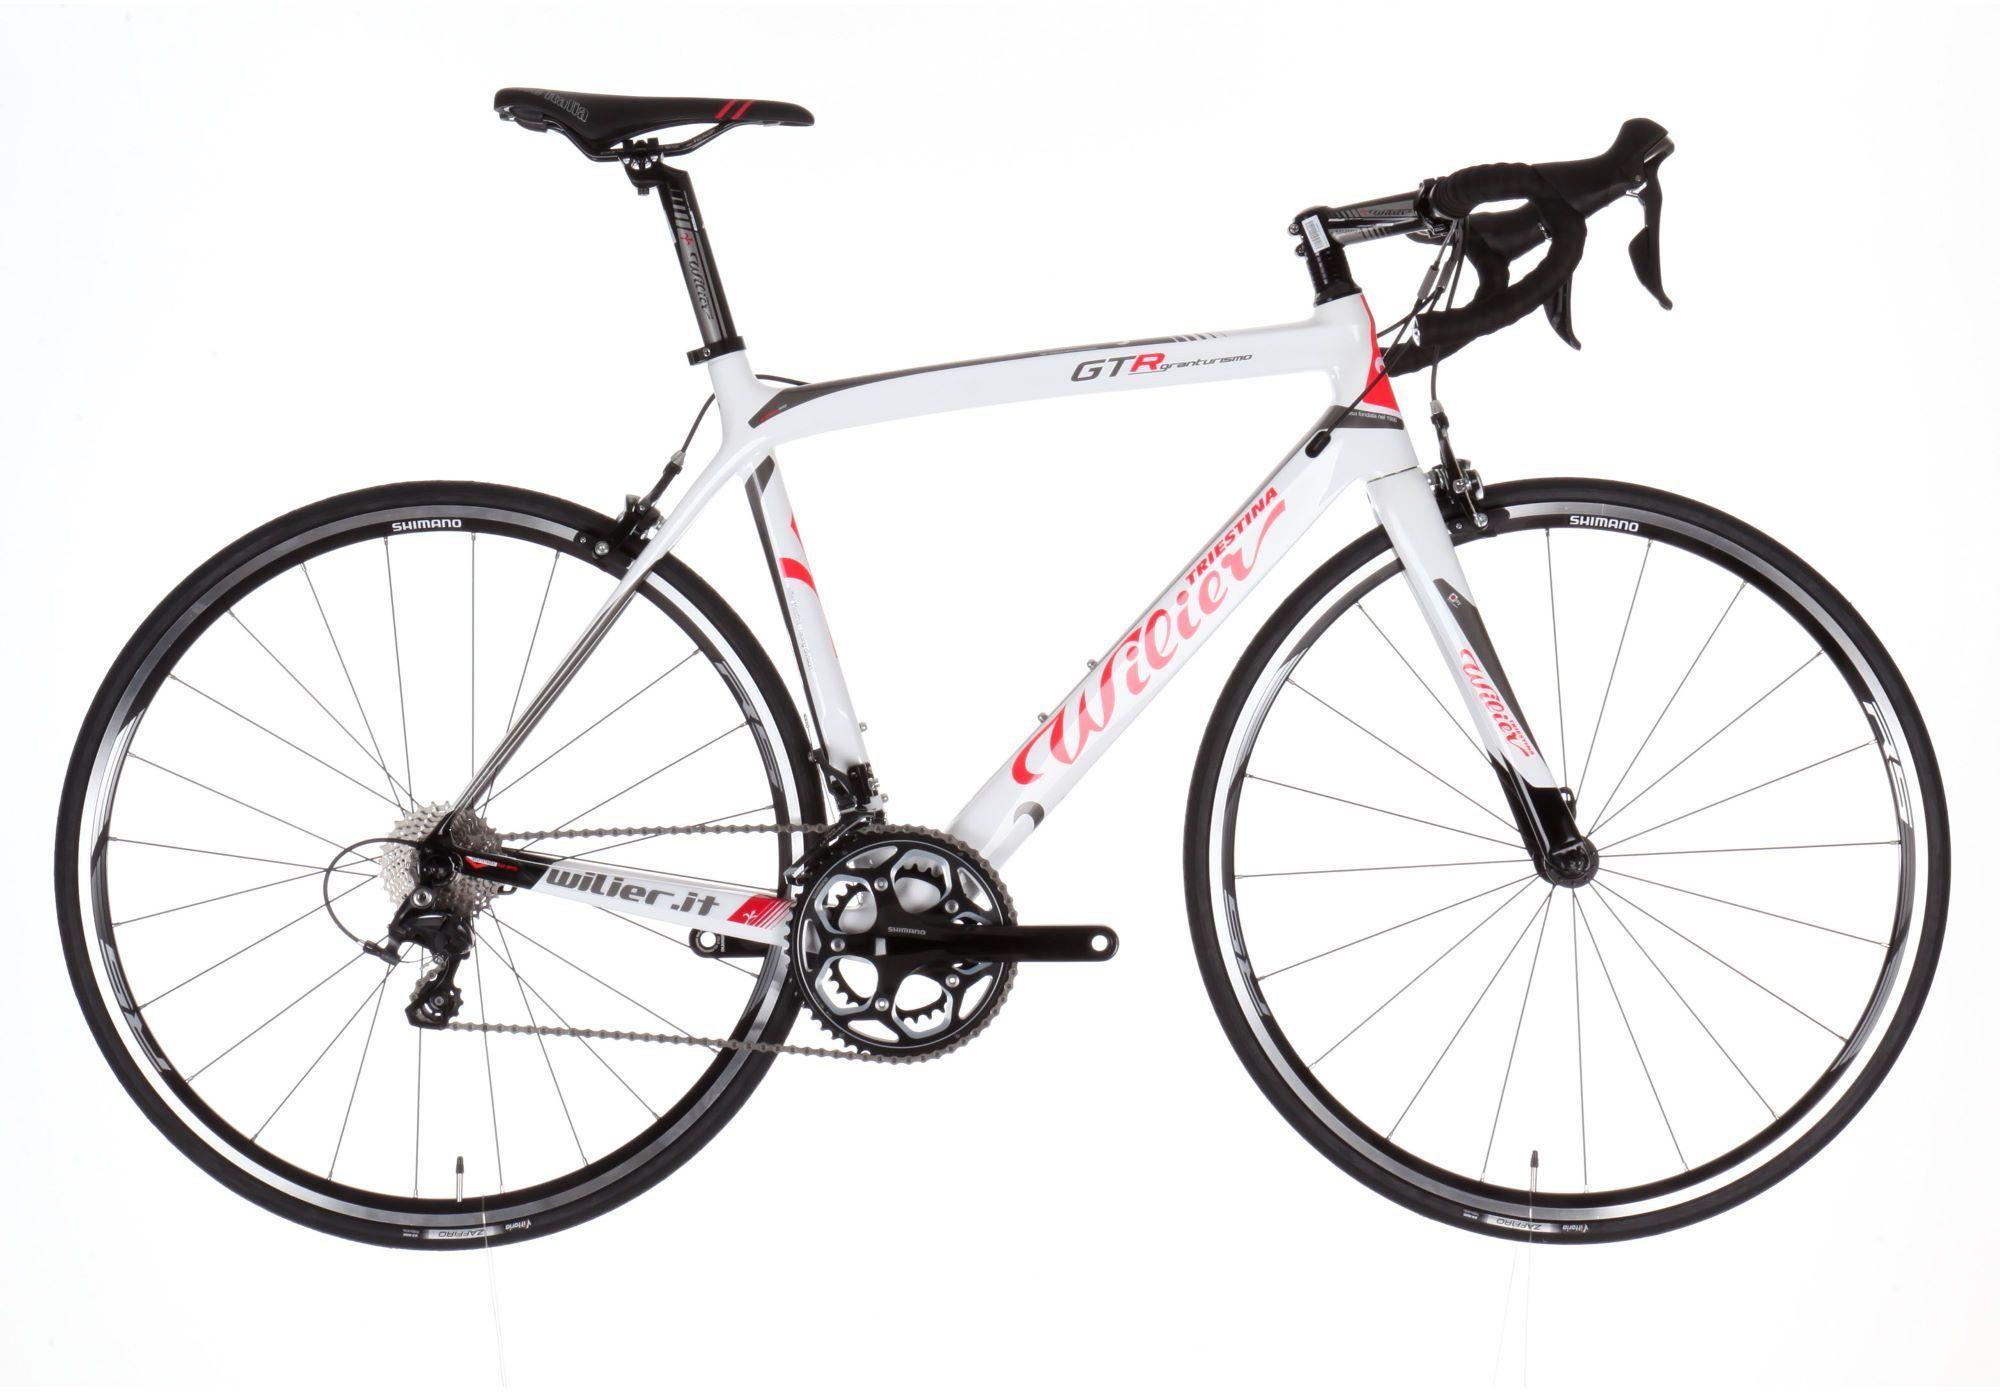 wilier gtr ultegra 11 fach mix rs010 white glossy 2015 bikesportworld in freiburg. Black Bedroom Furniture Sets. Home Design Ideas